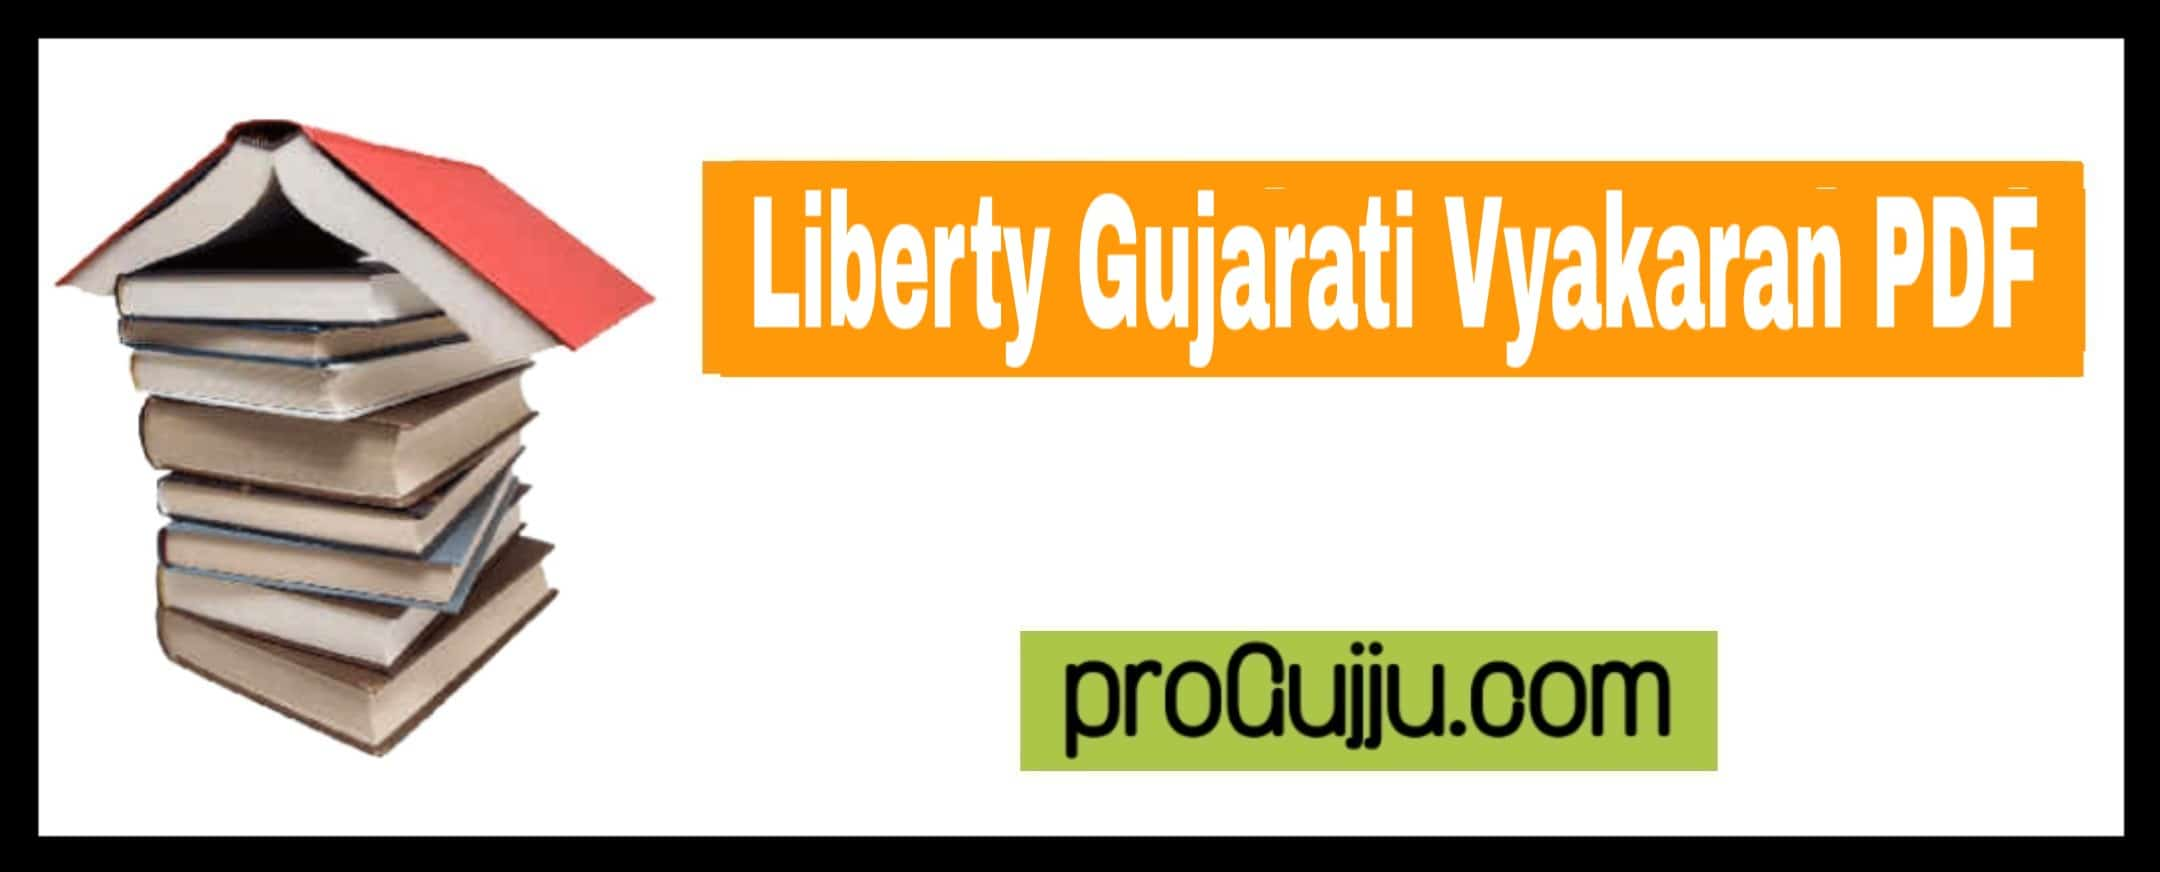 Liberty Gujarati Vyakaran PDF